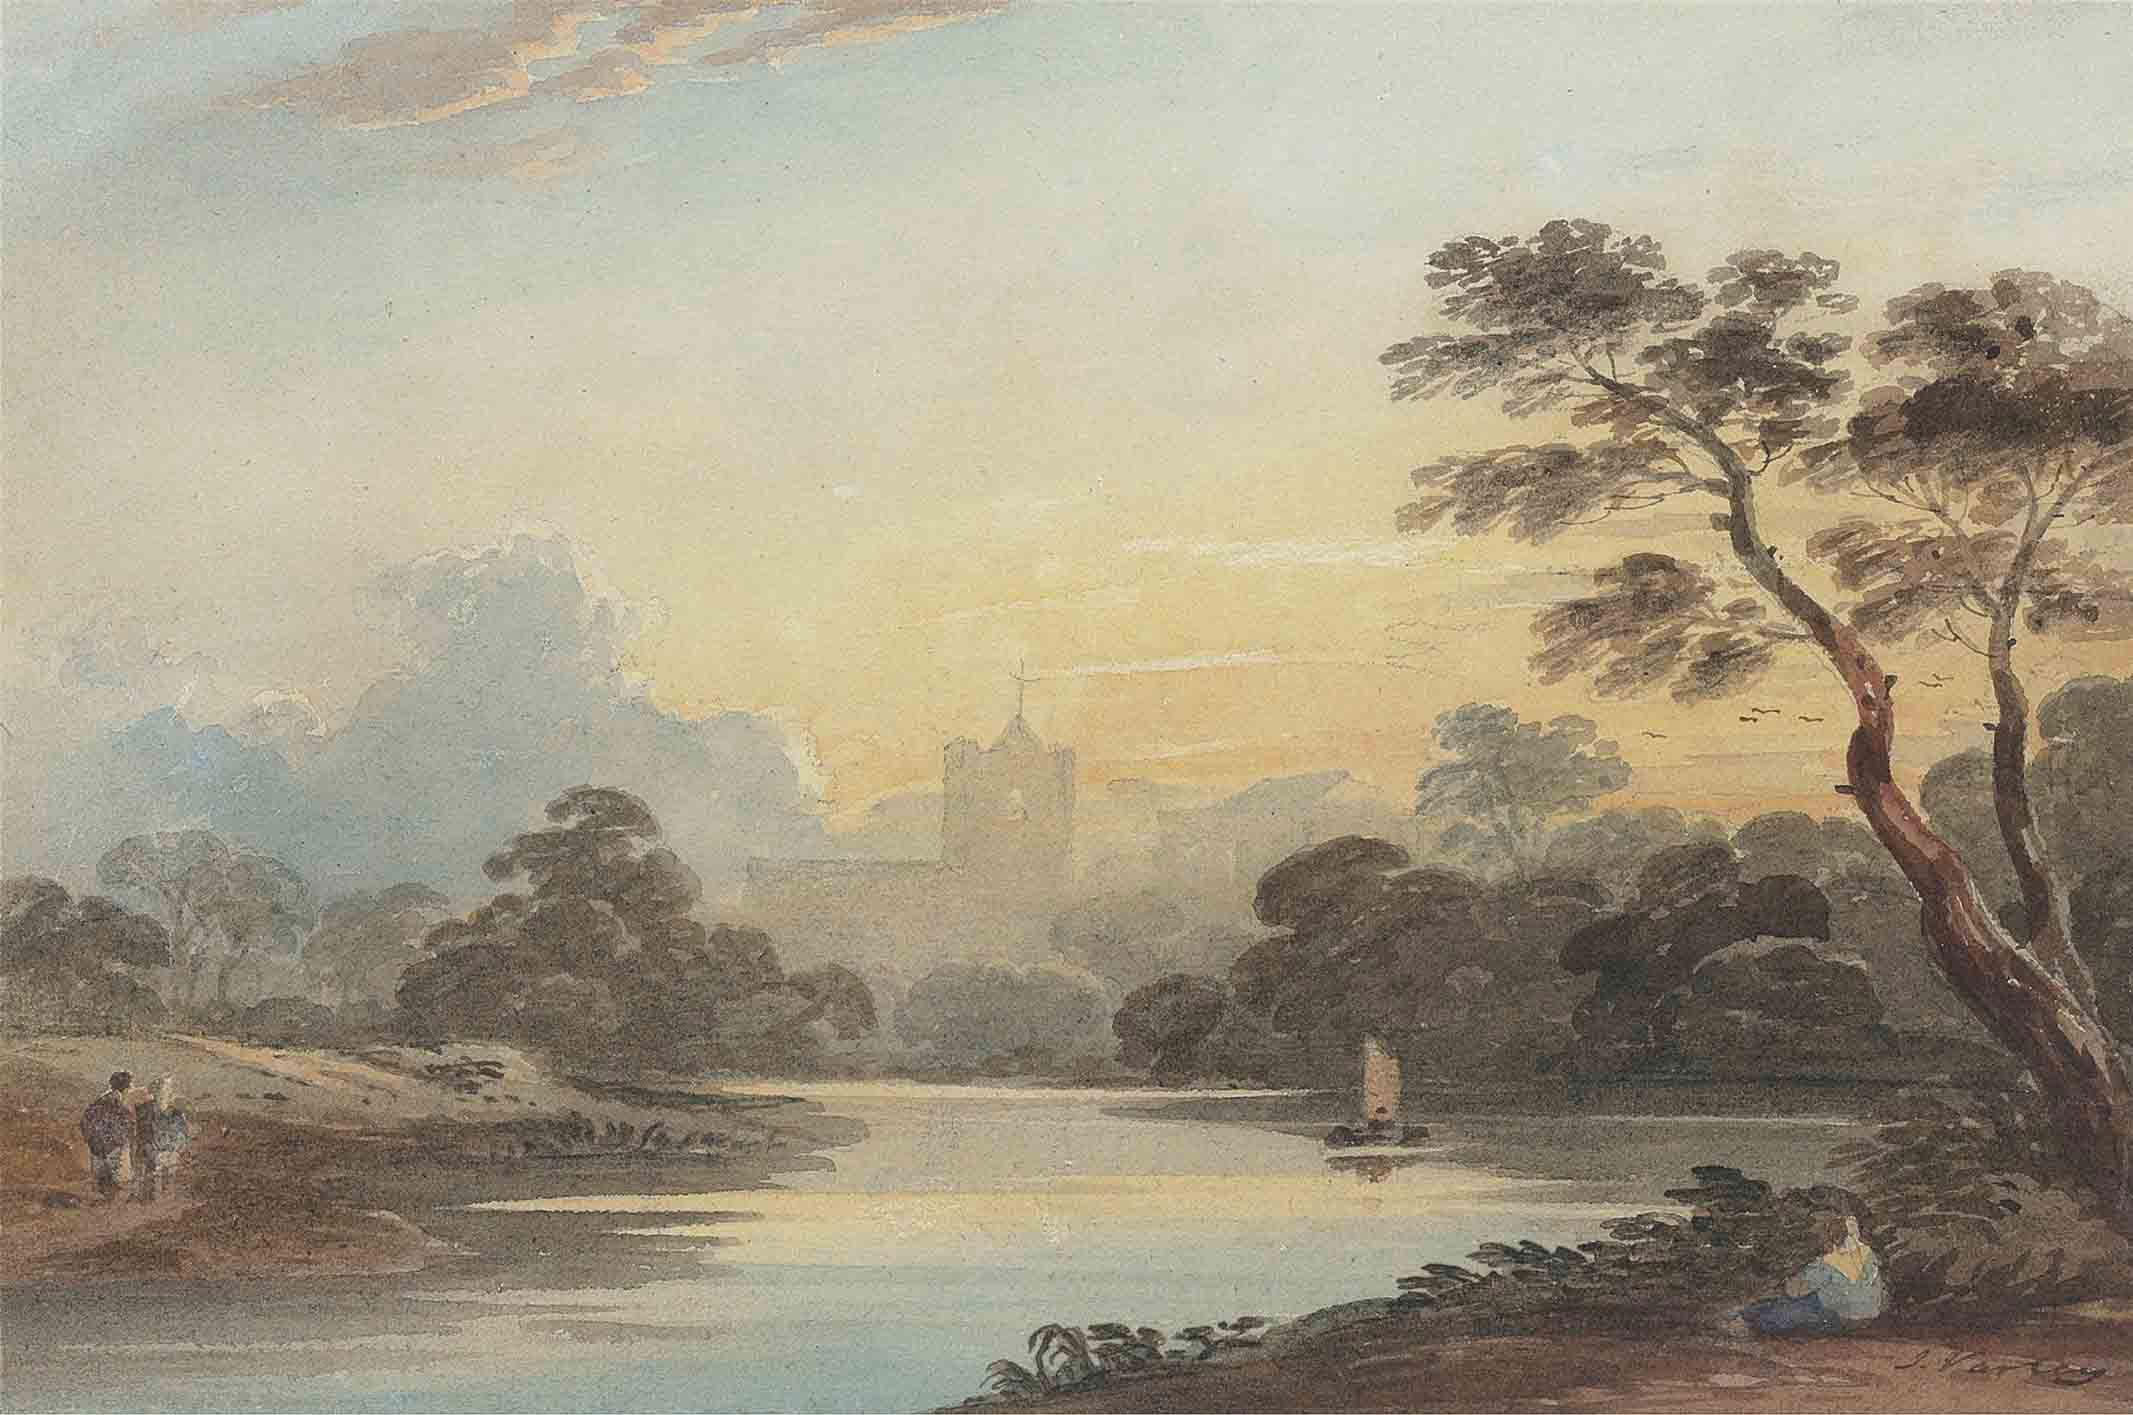 John Varley, O.W.S. (London 17